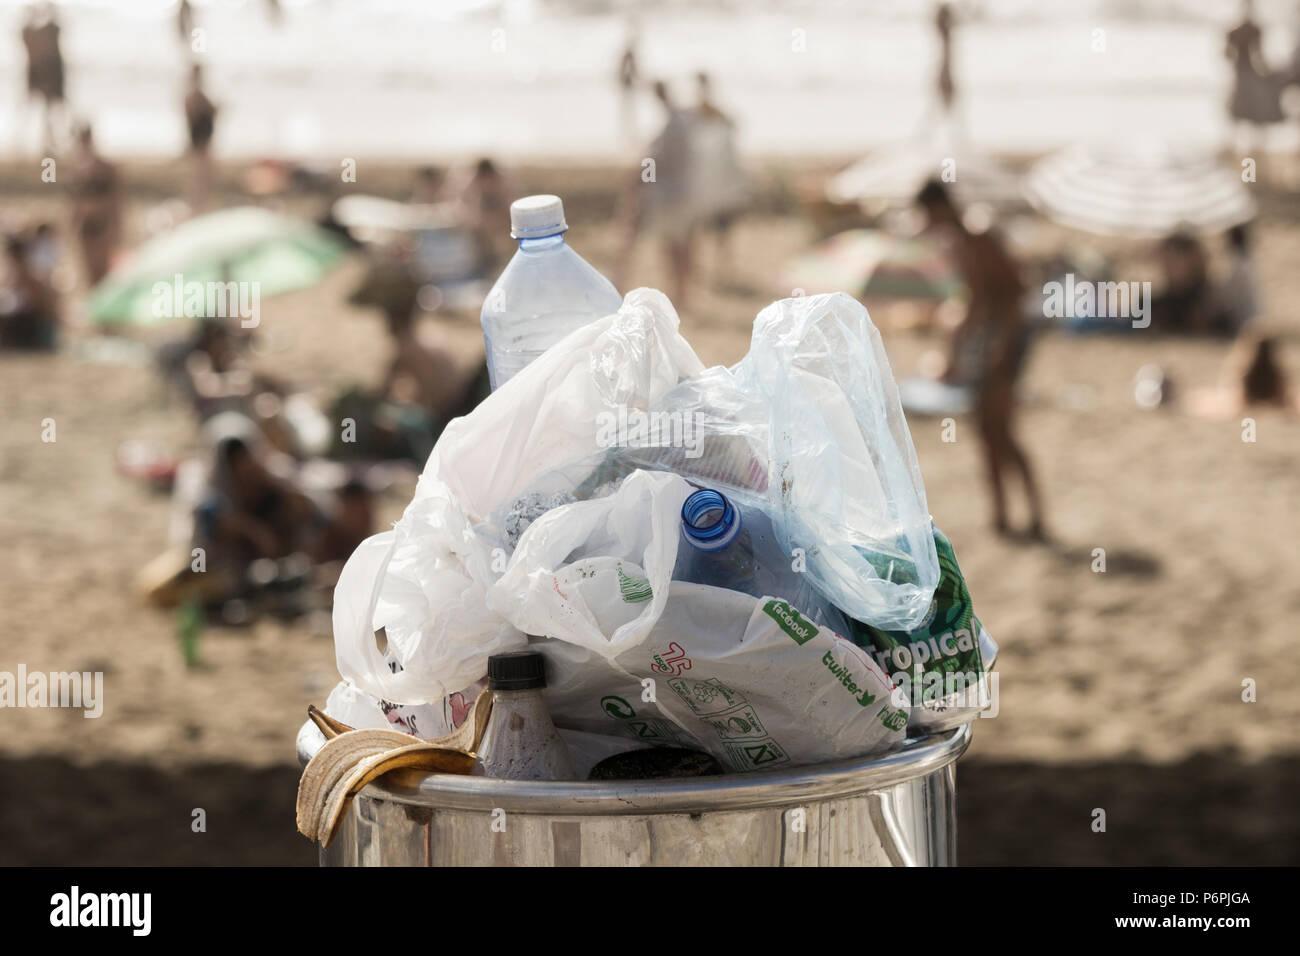 Overflowing litter bin full of plastic bottles and plastic bags on beach Stock Photo